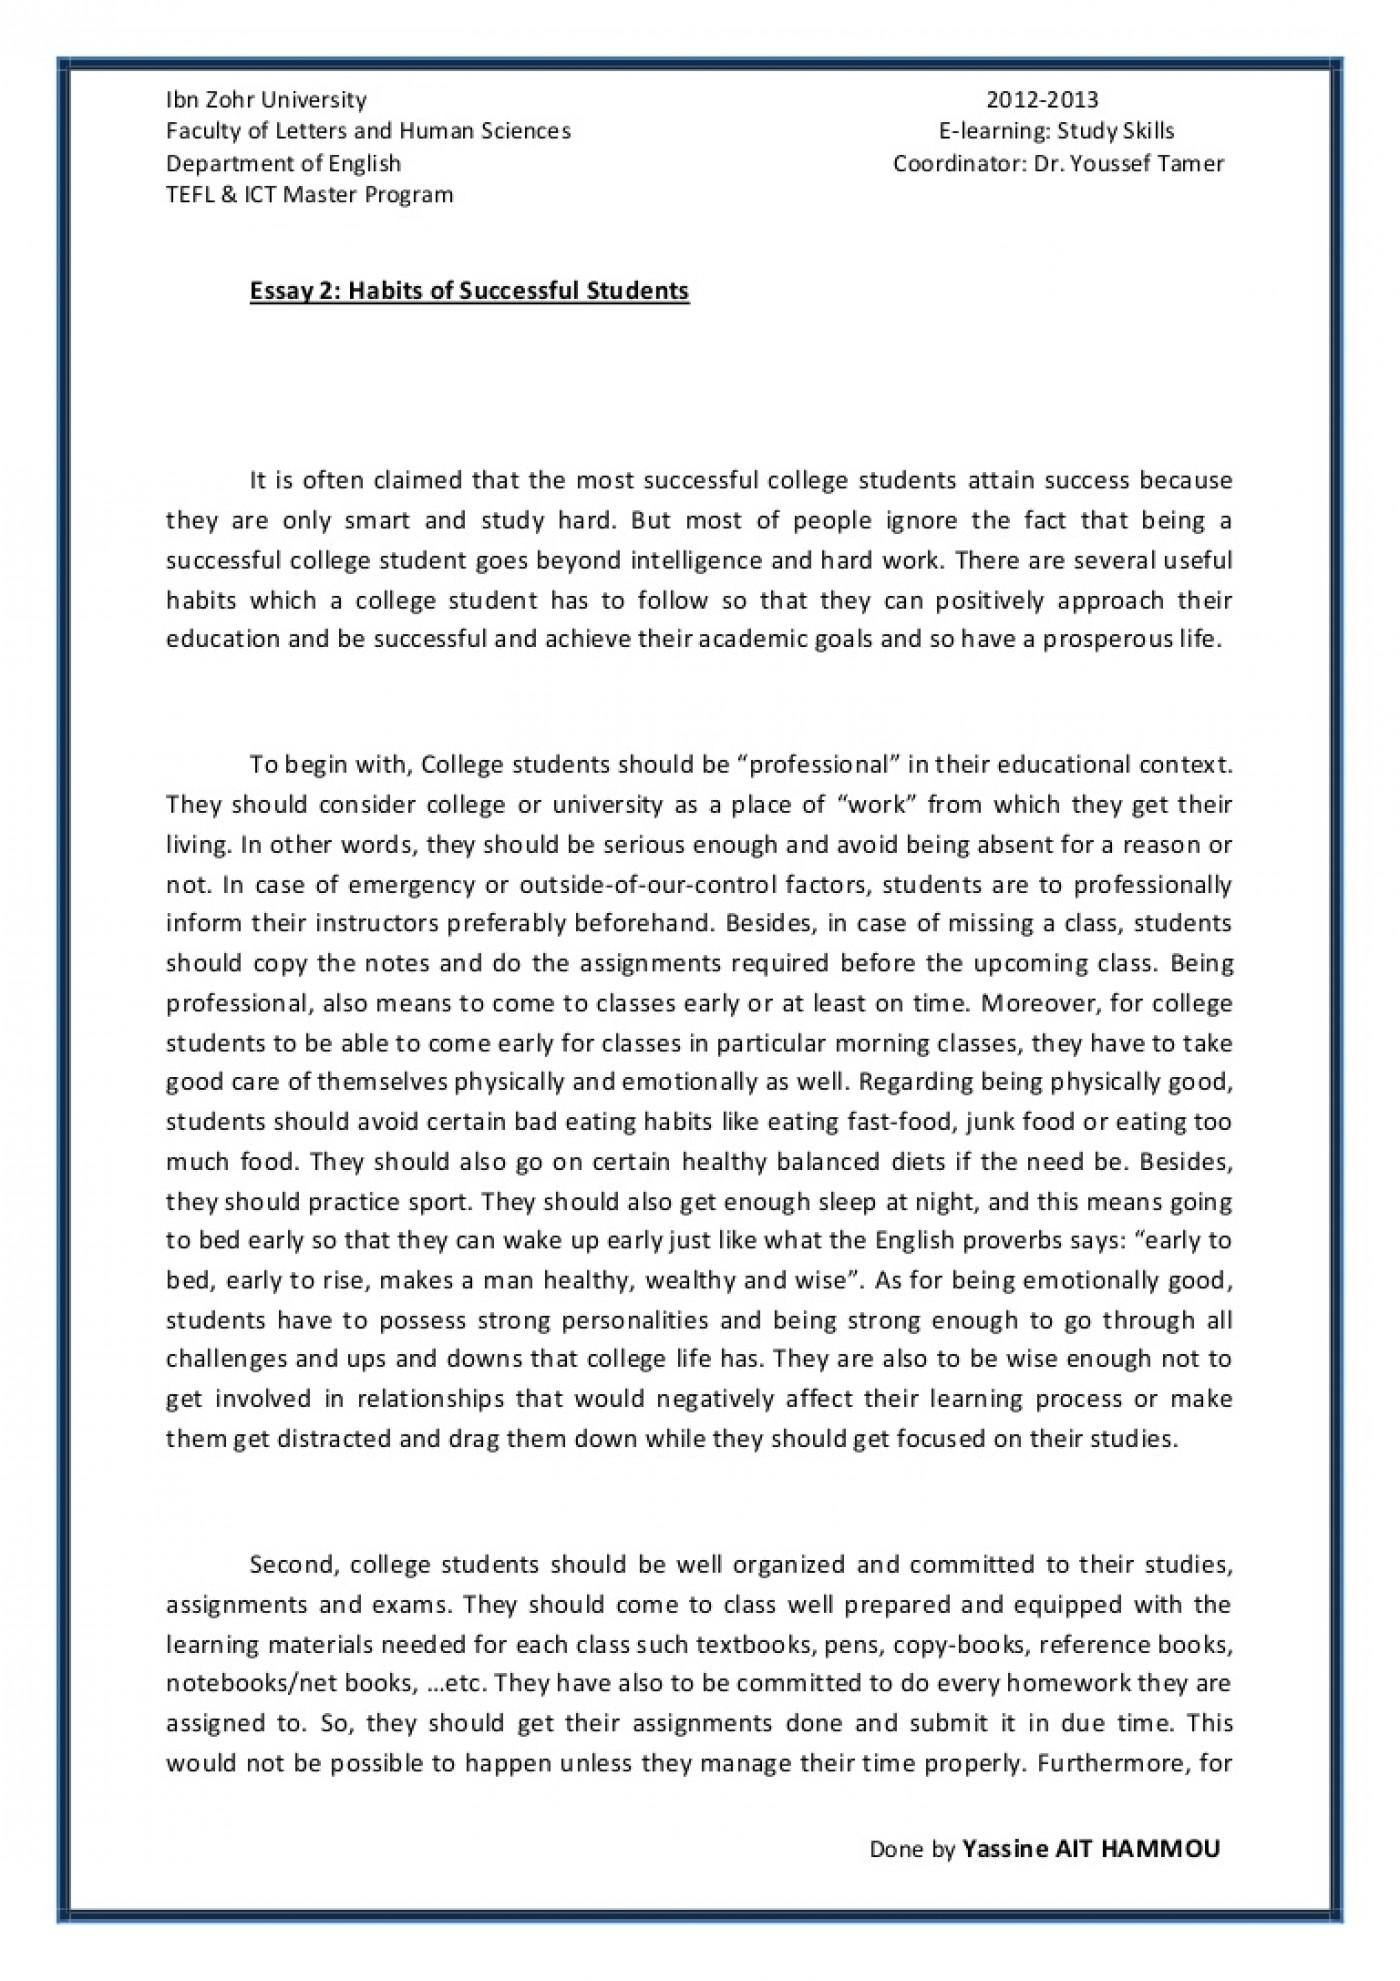 014 Essay Example Essay2 Succesfulcollegestudentshabitsbyyassineaithammou Phpapp01 Thumbnail On Achieving Stunning A Goal Narrative 1400